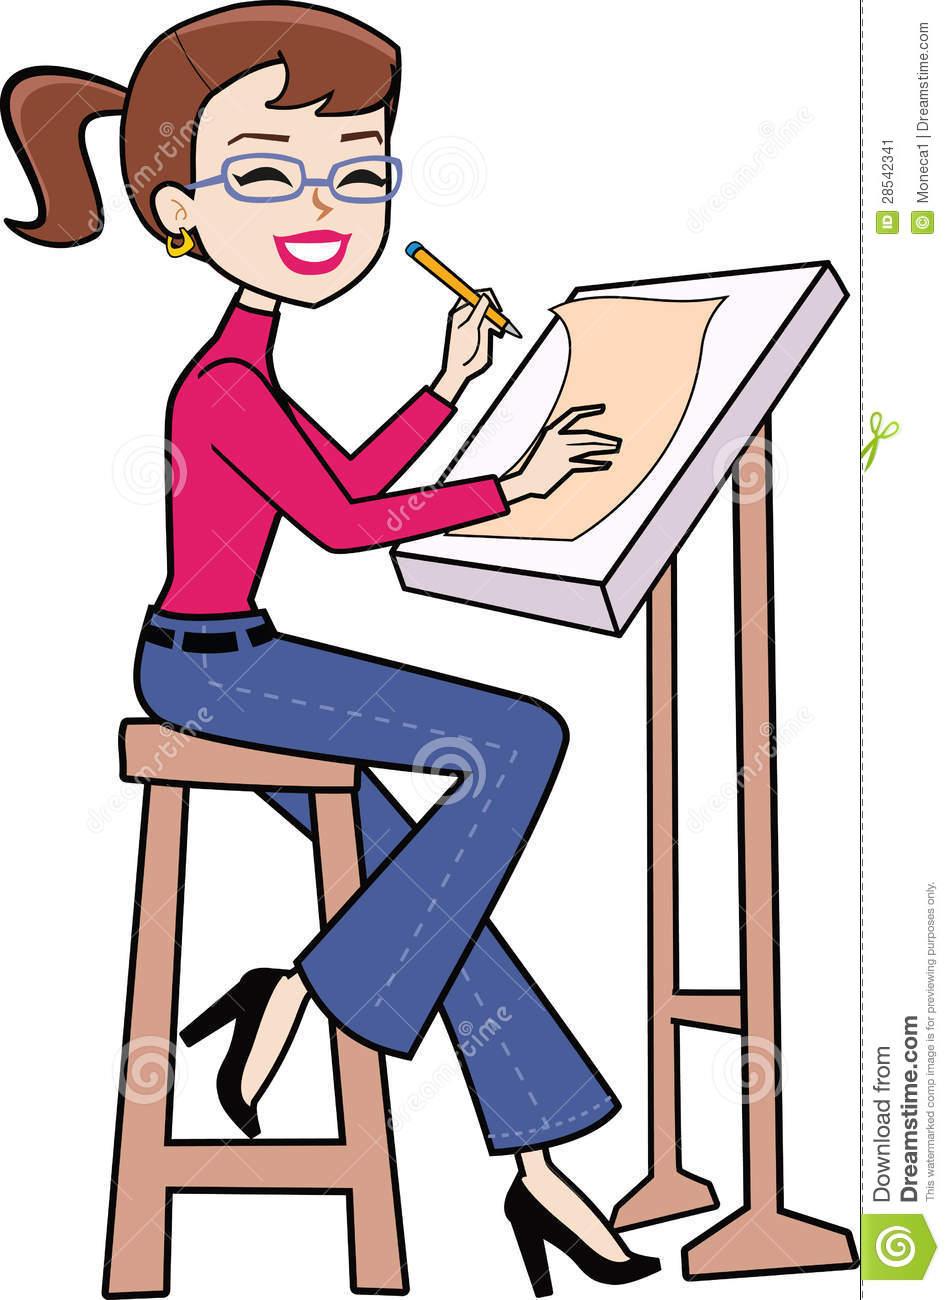 Artistic woman clipart - ClipartFox jpg freeuse